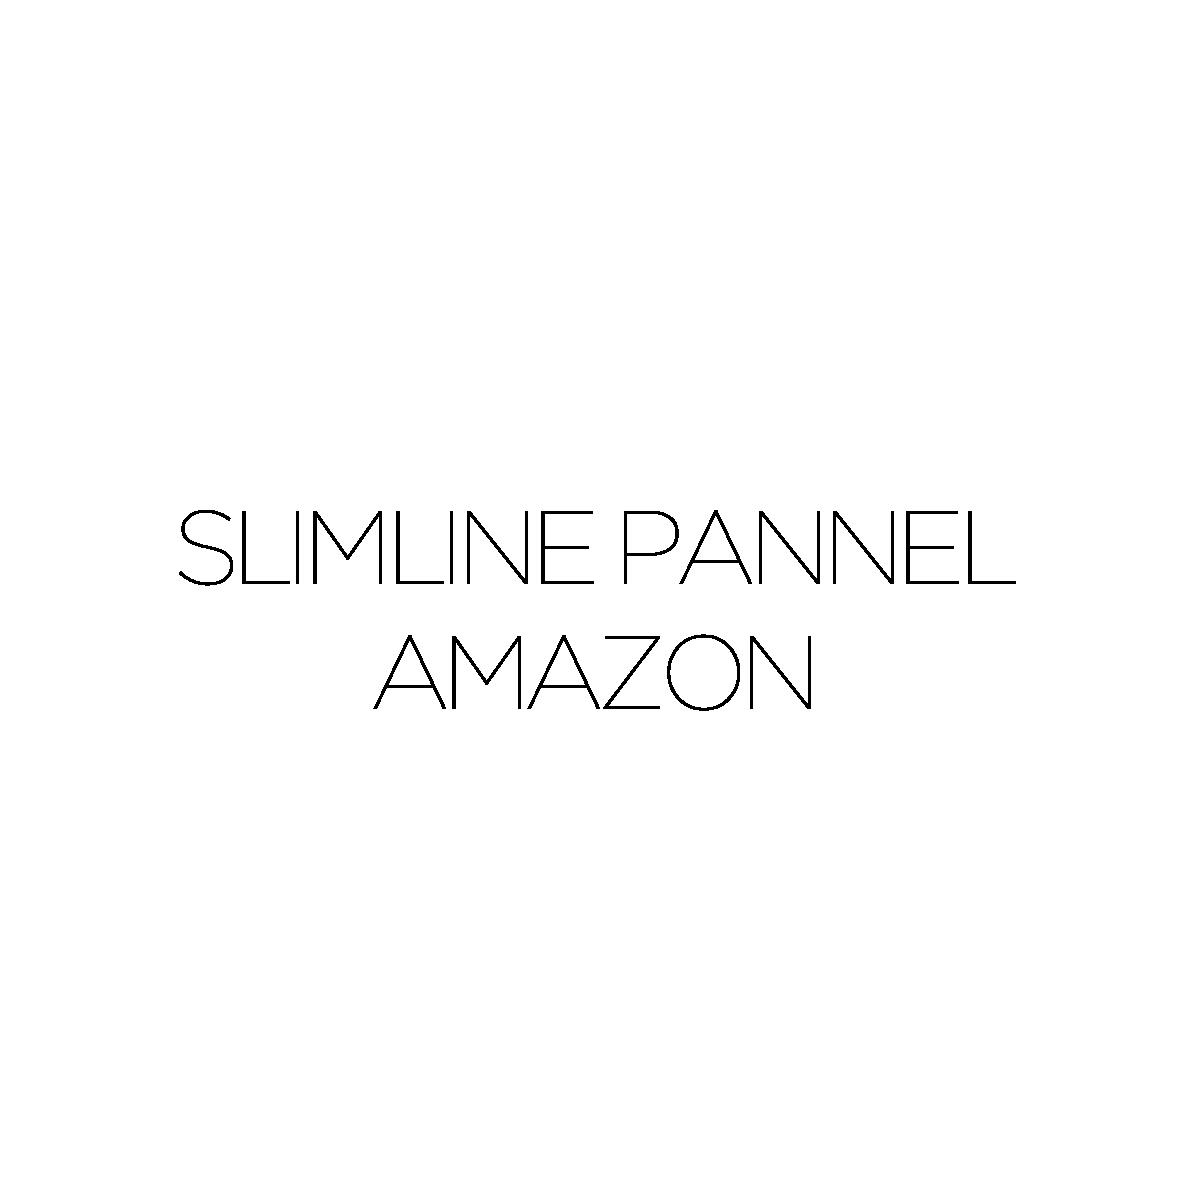 amazon-07